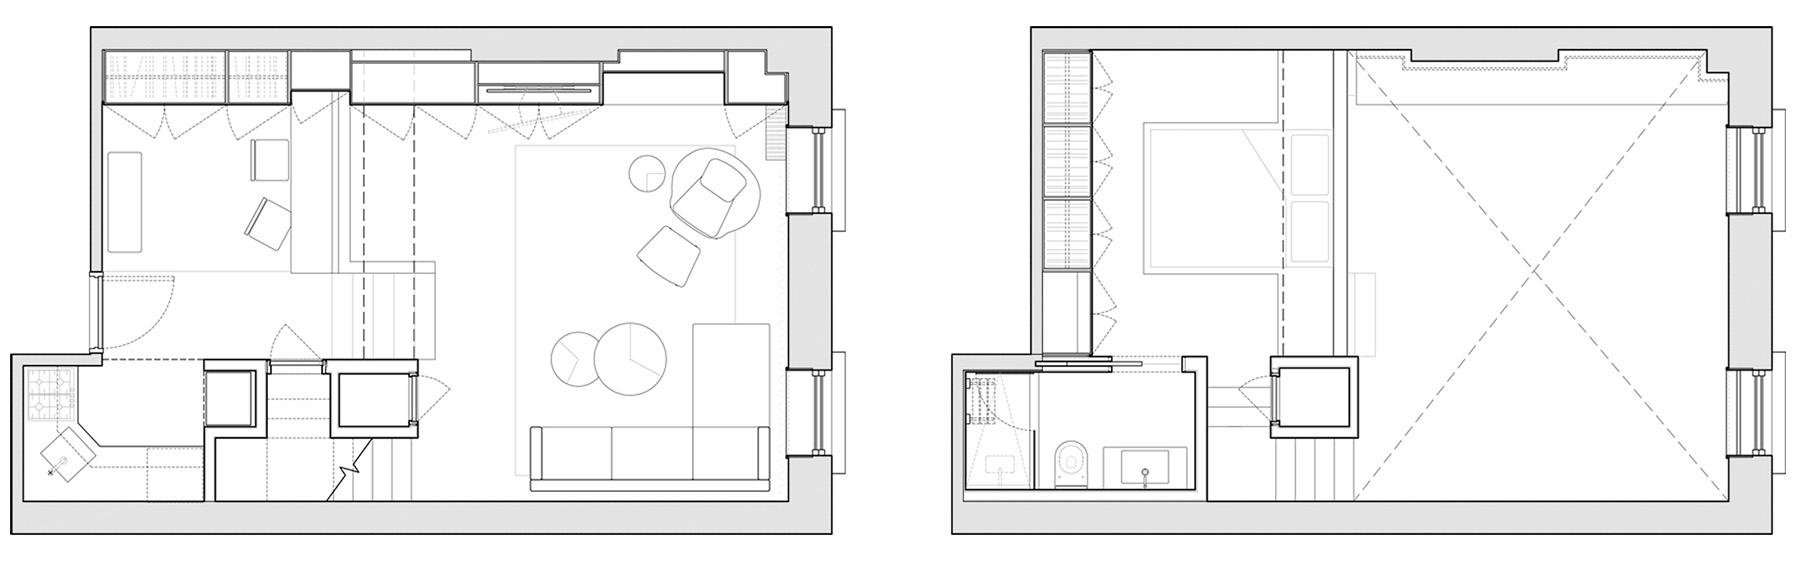 Floor Plan, uws apartment, stadt architecture, christopher kitterman, upper west side apartment, STADT, STADT Architecture, New York City Architect